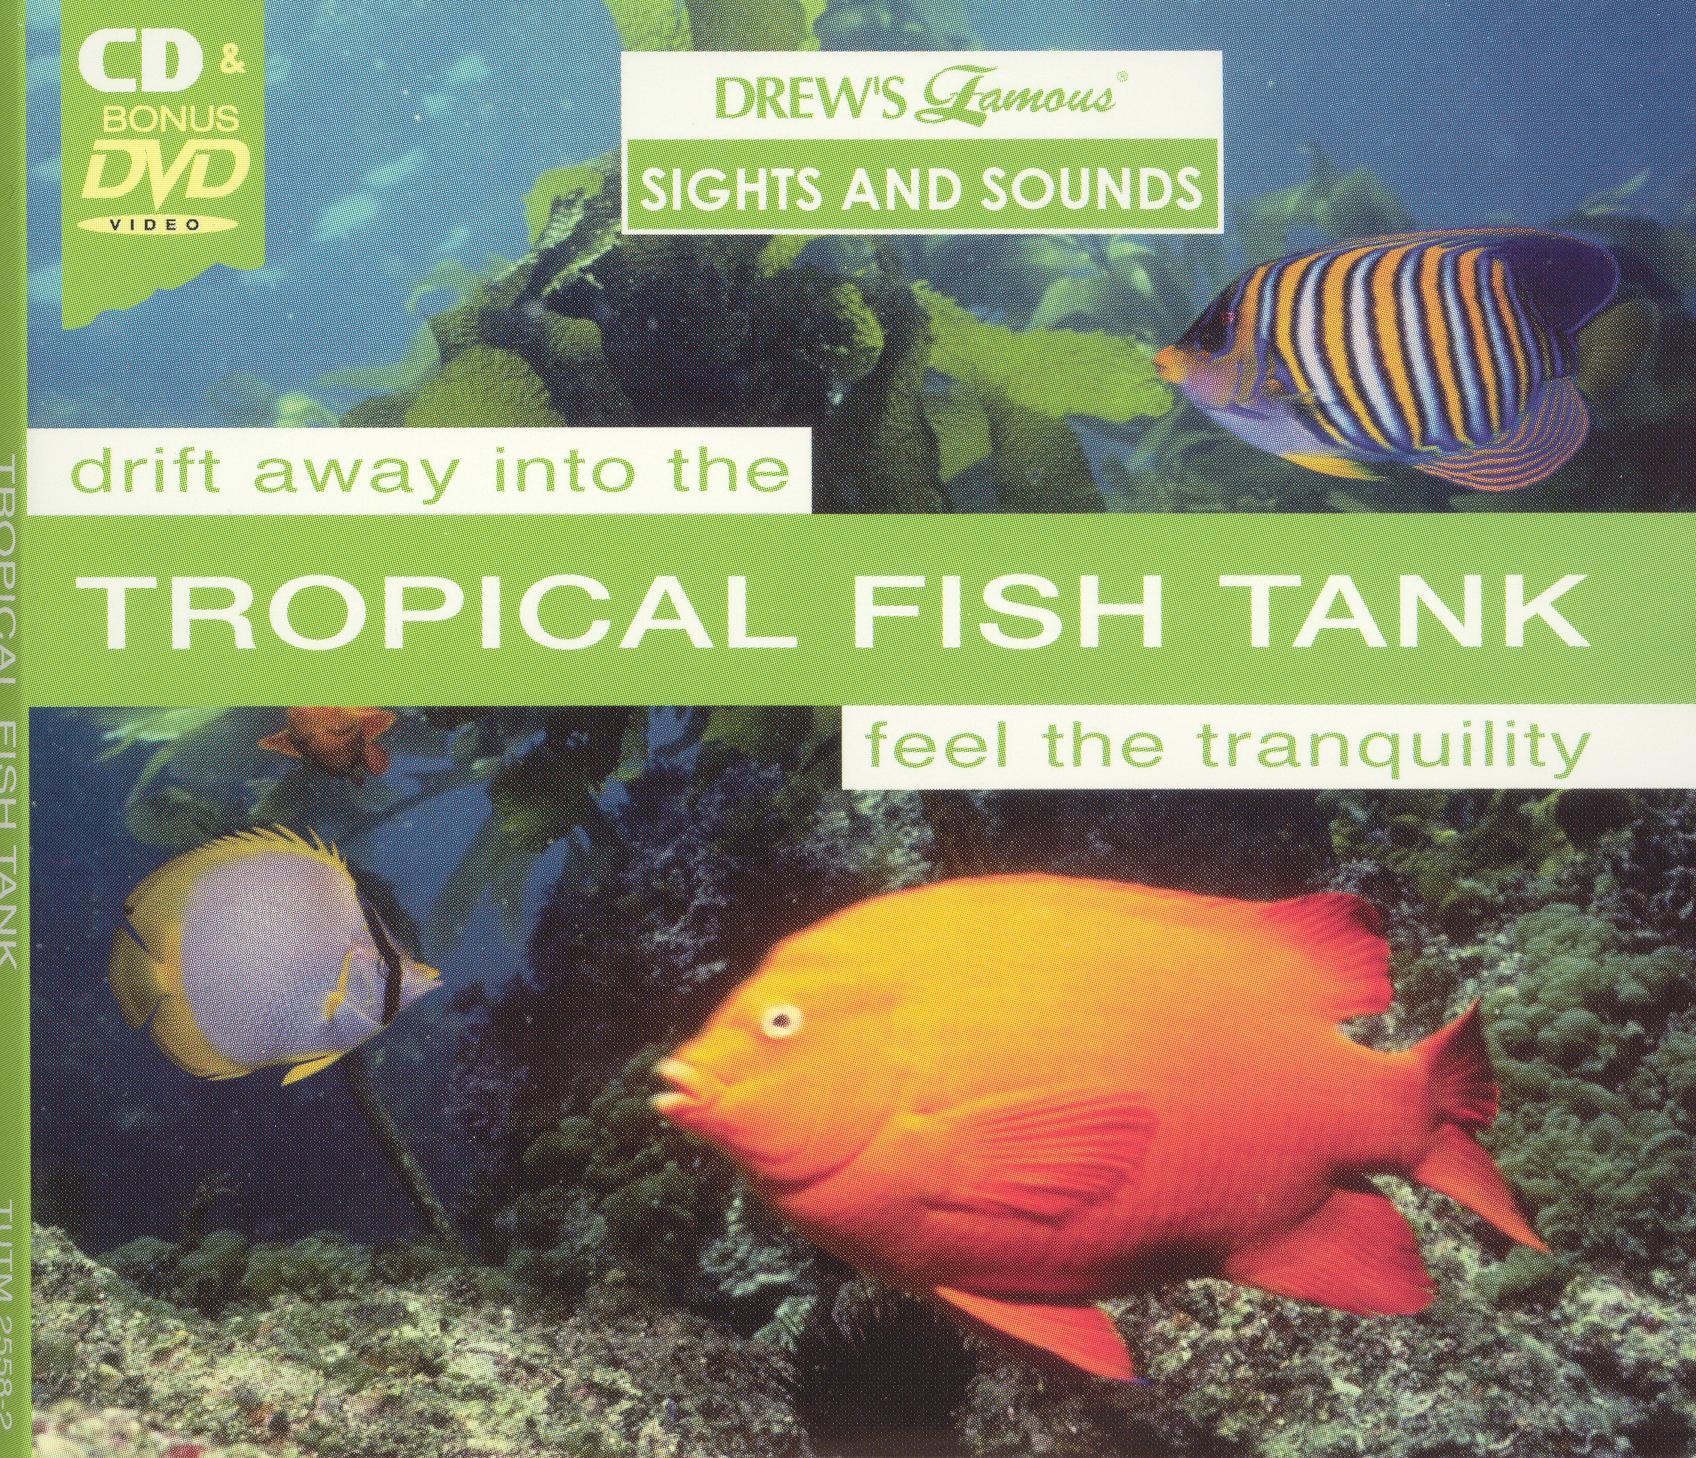 Drew's Famous Sights & Sounds: Tropical Fish Tank